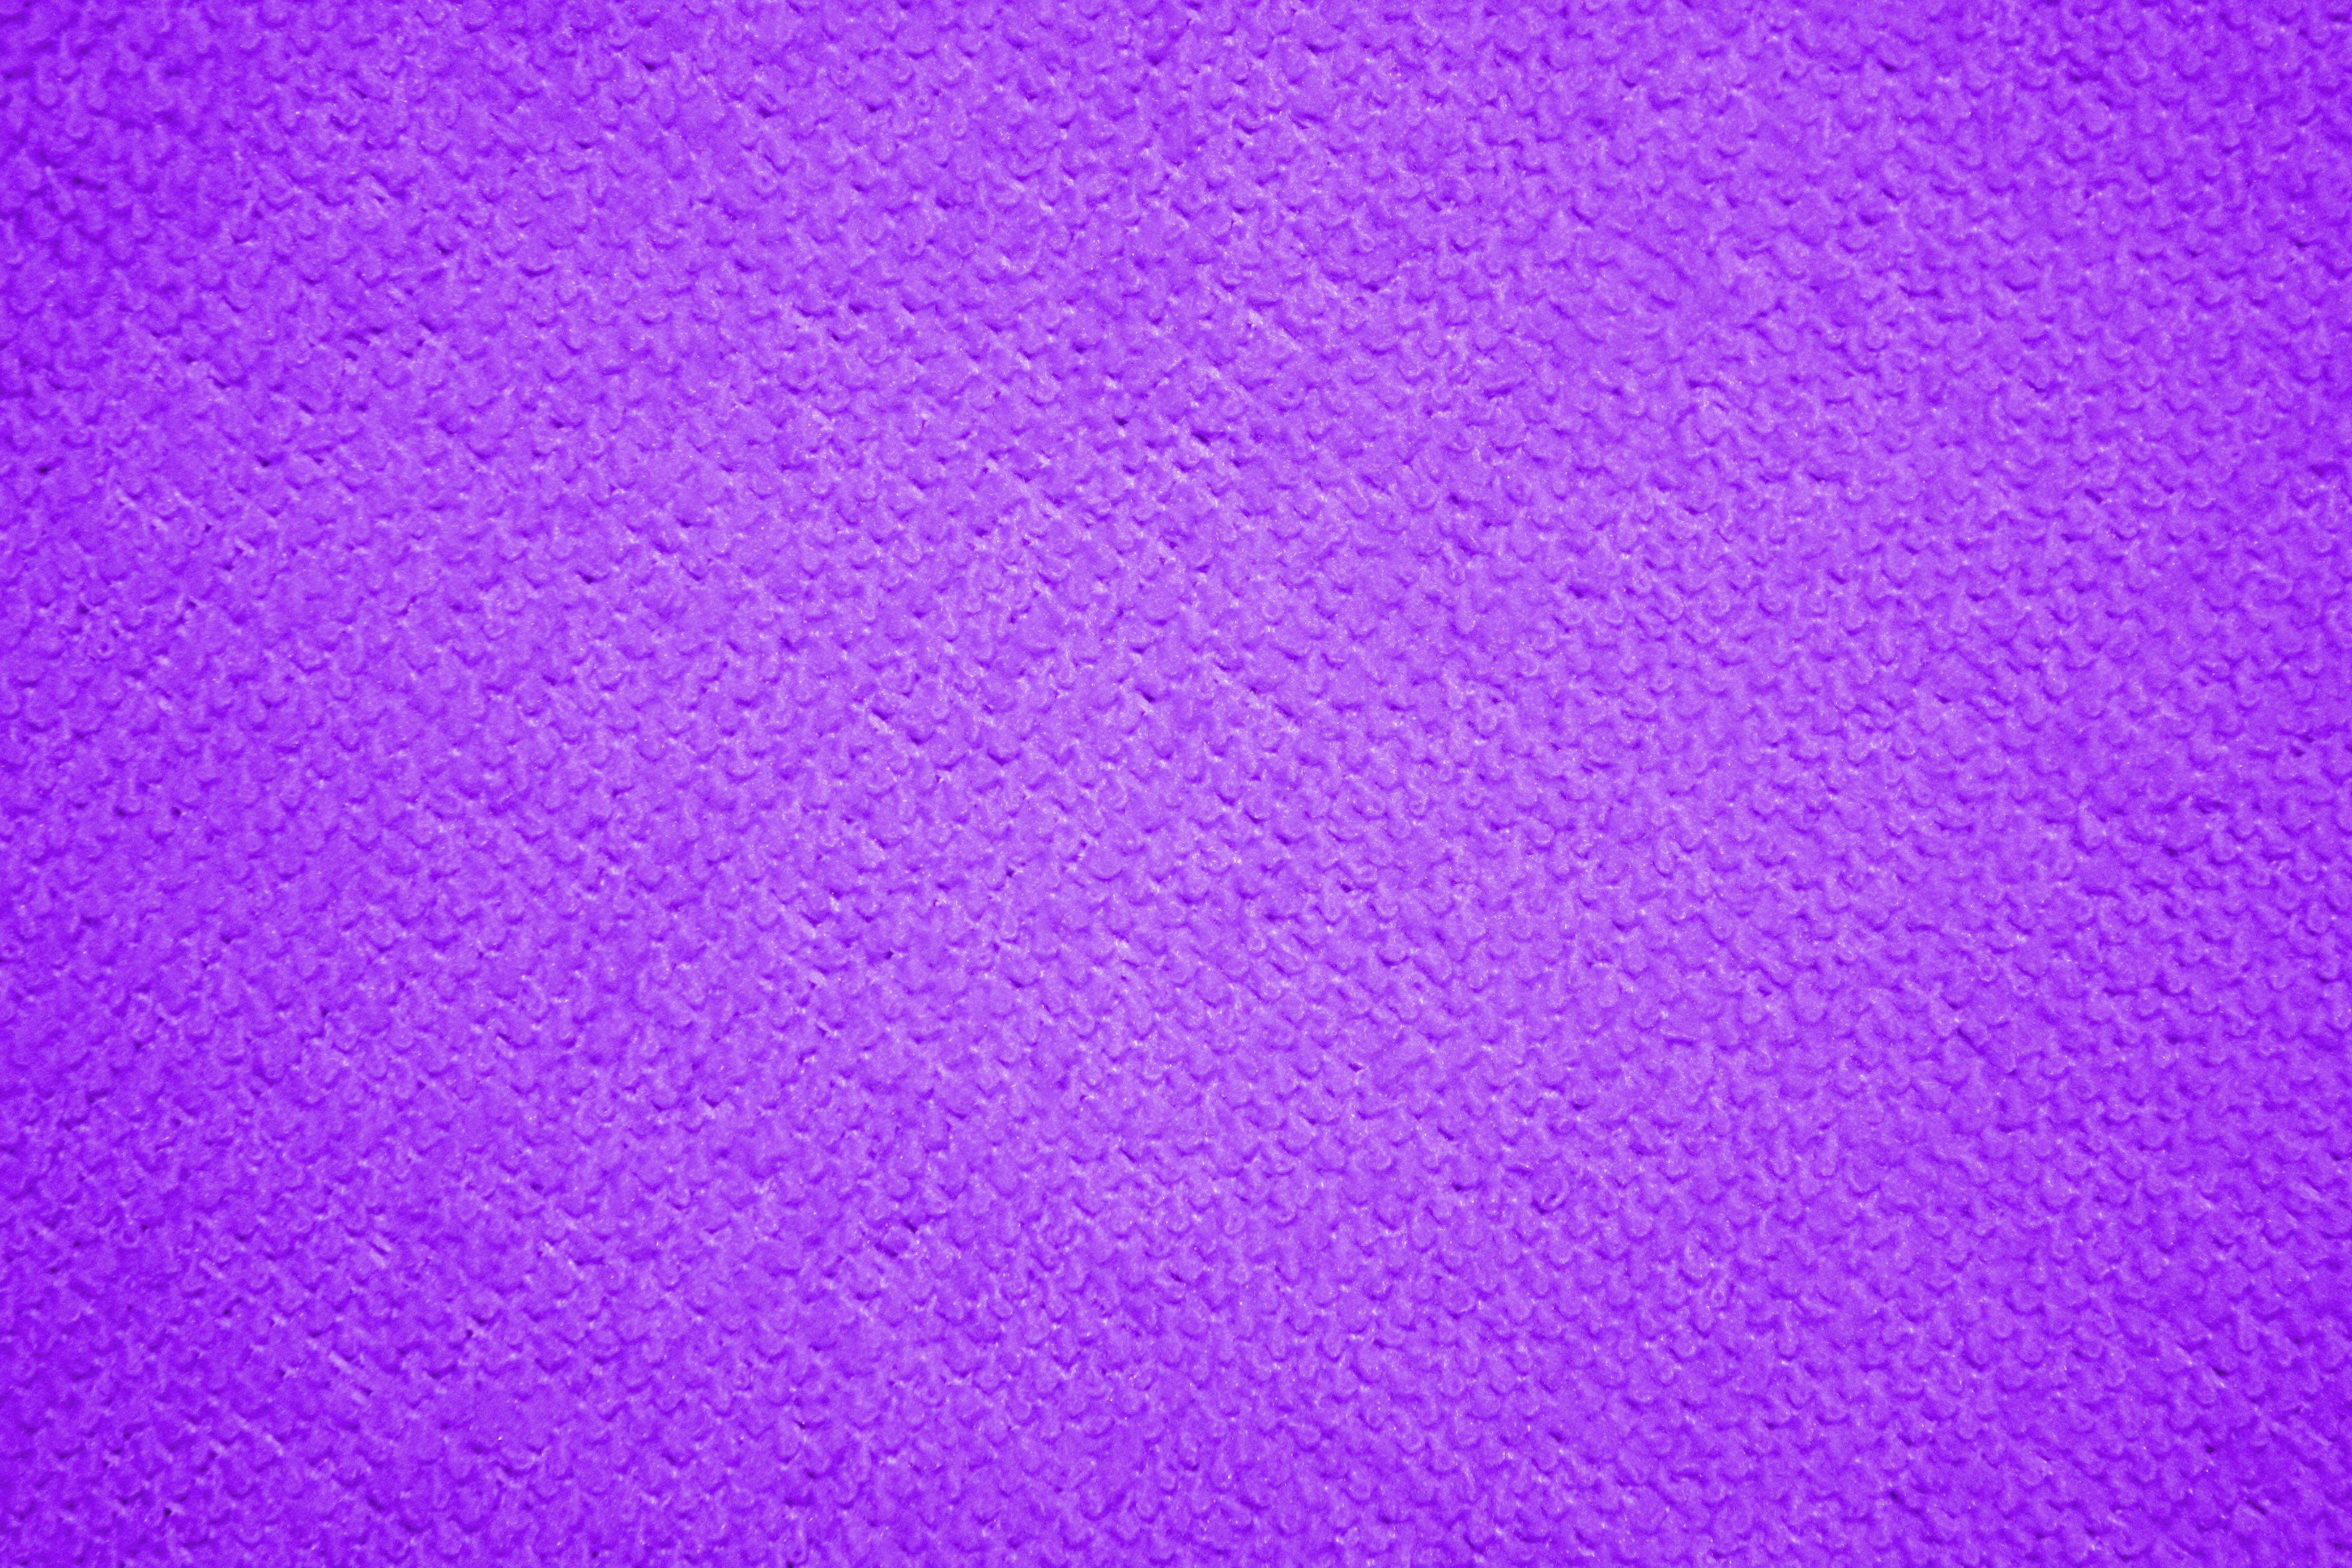 Purple Microfiber Cloth Fabric Texture Picture Free